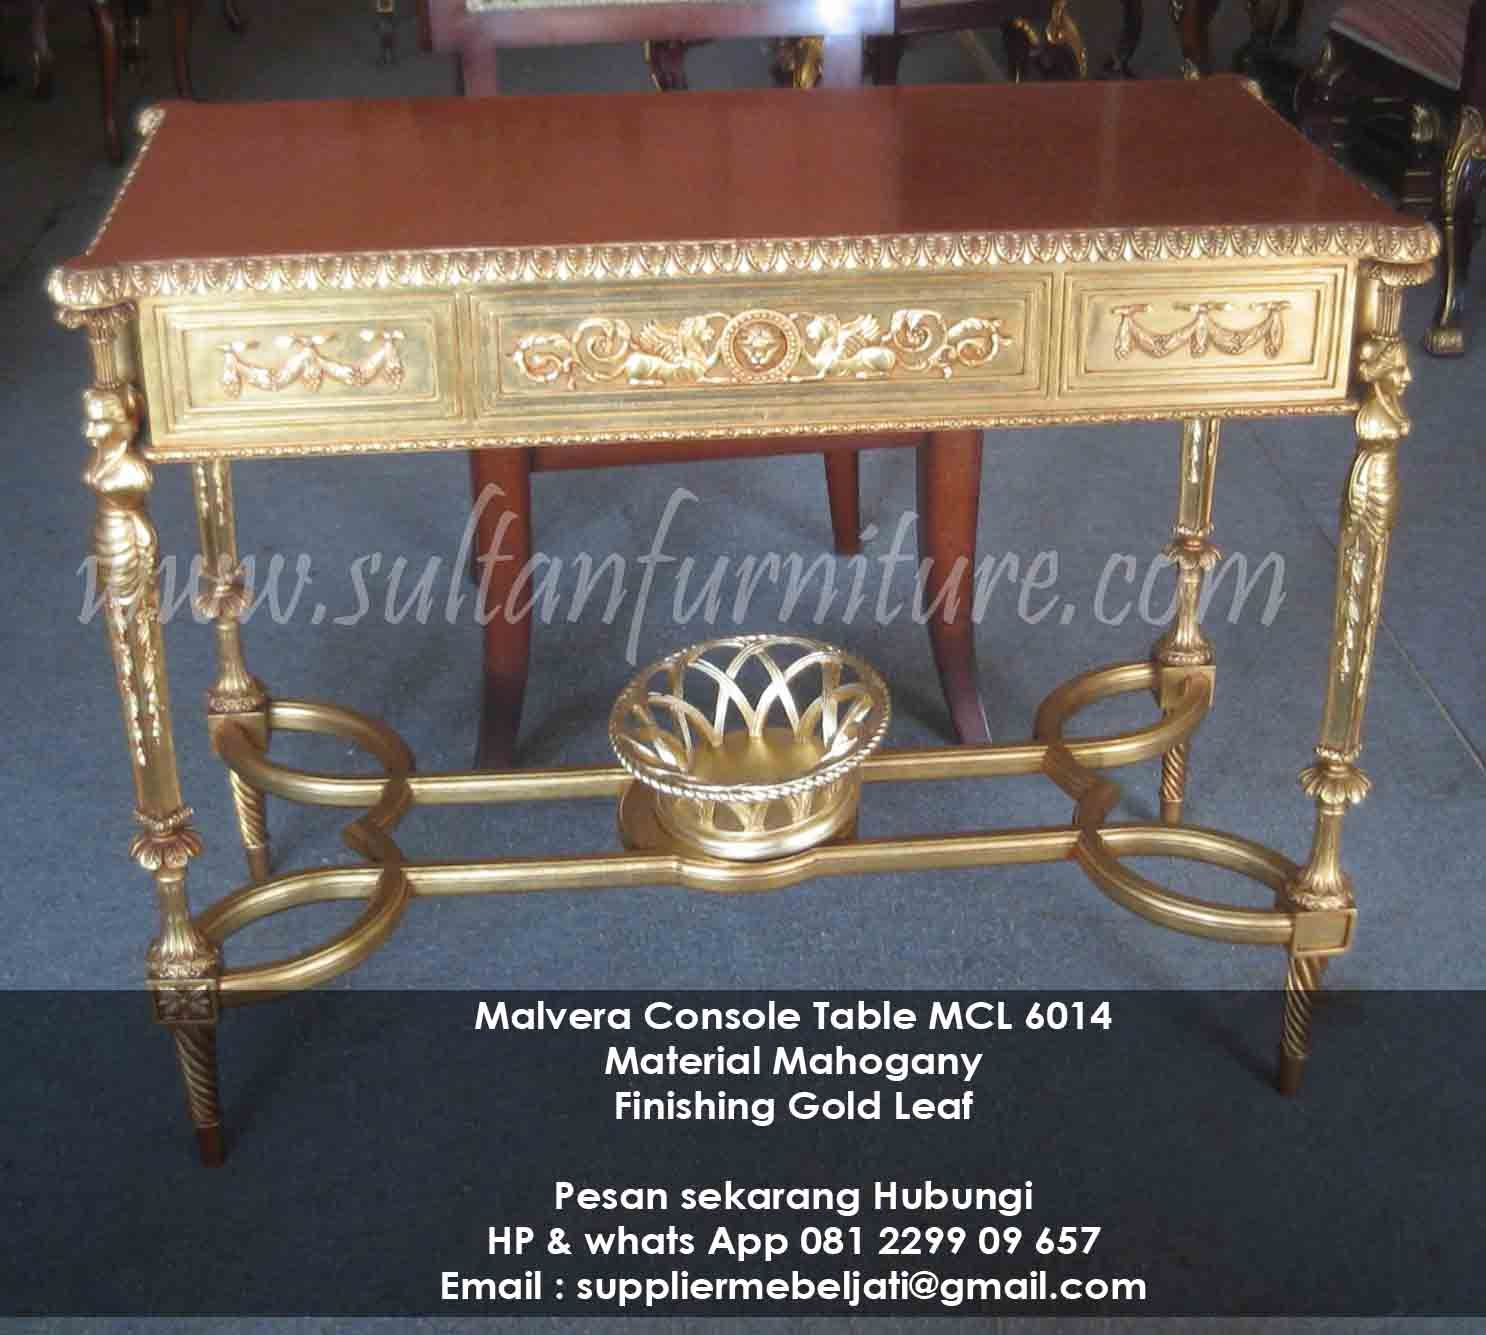 Meja Konsole Ukir Malvera Furniture Klasik Modern Style Jepara  # Tofteryd Meuble Tv